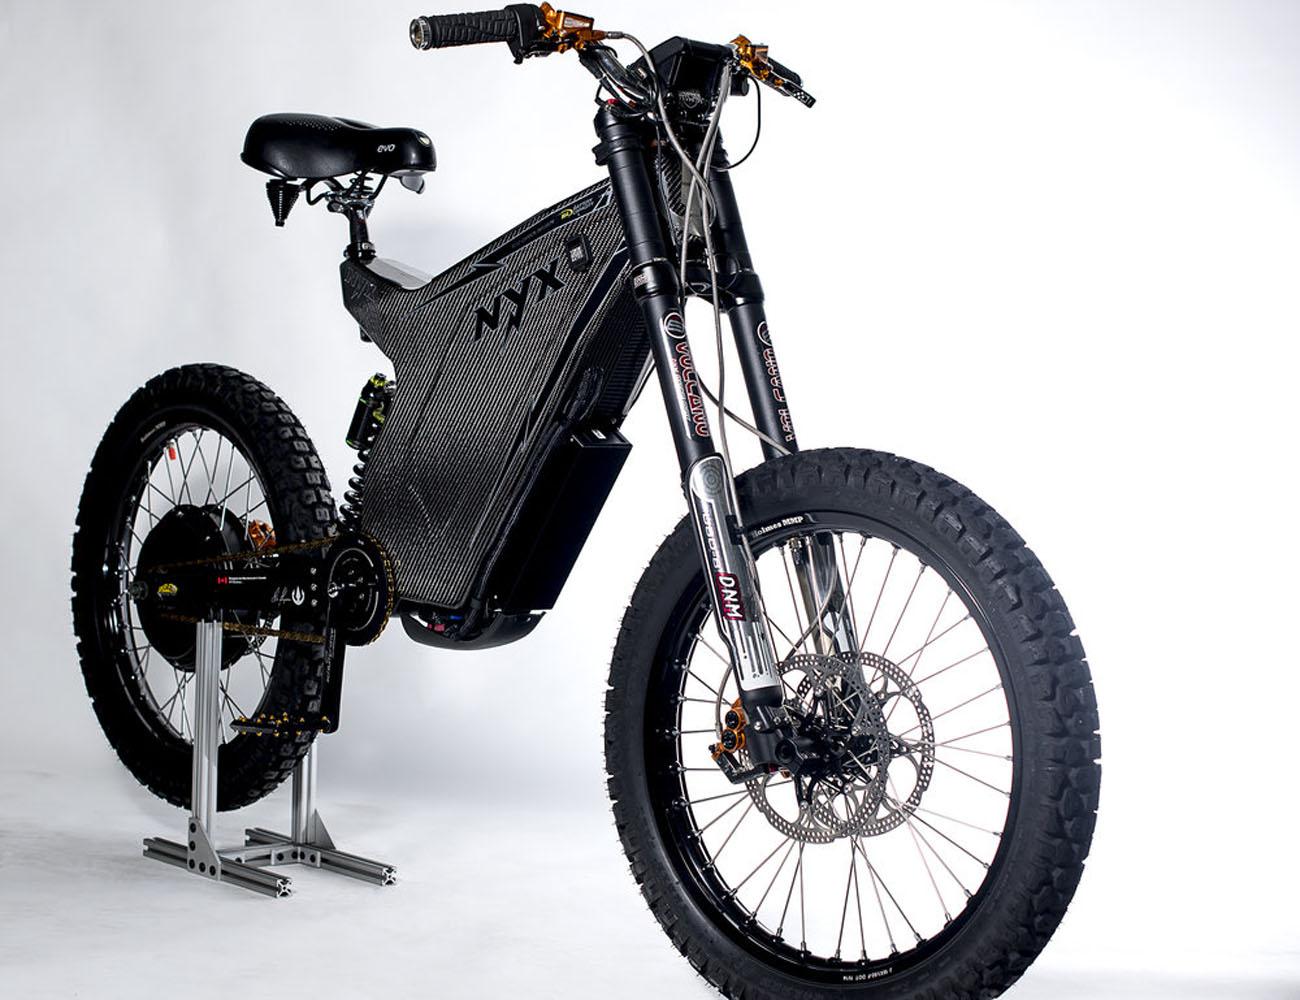 NYX 2015 : The World\'s First Carbon Fiber E-Bike Frame Kit » Gadget Flow